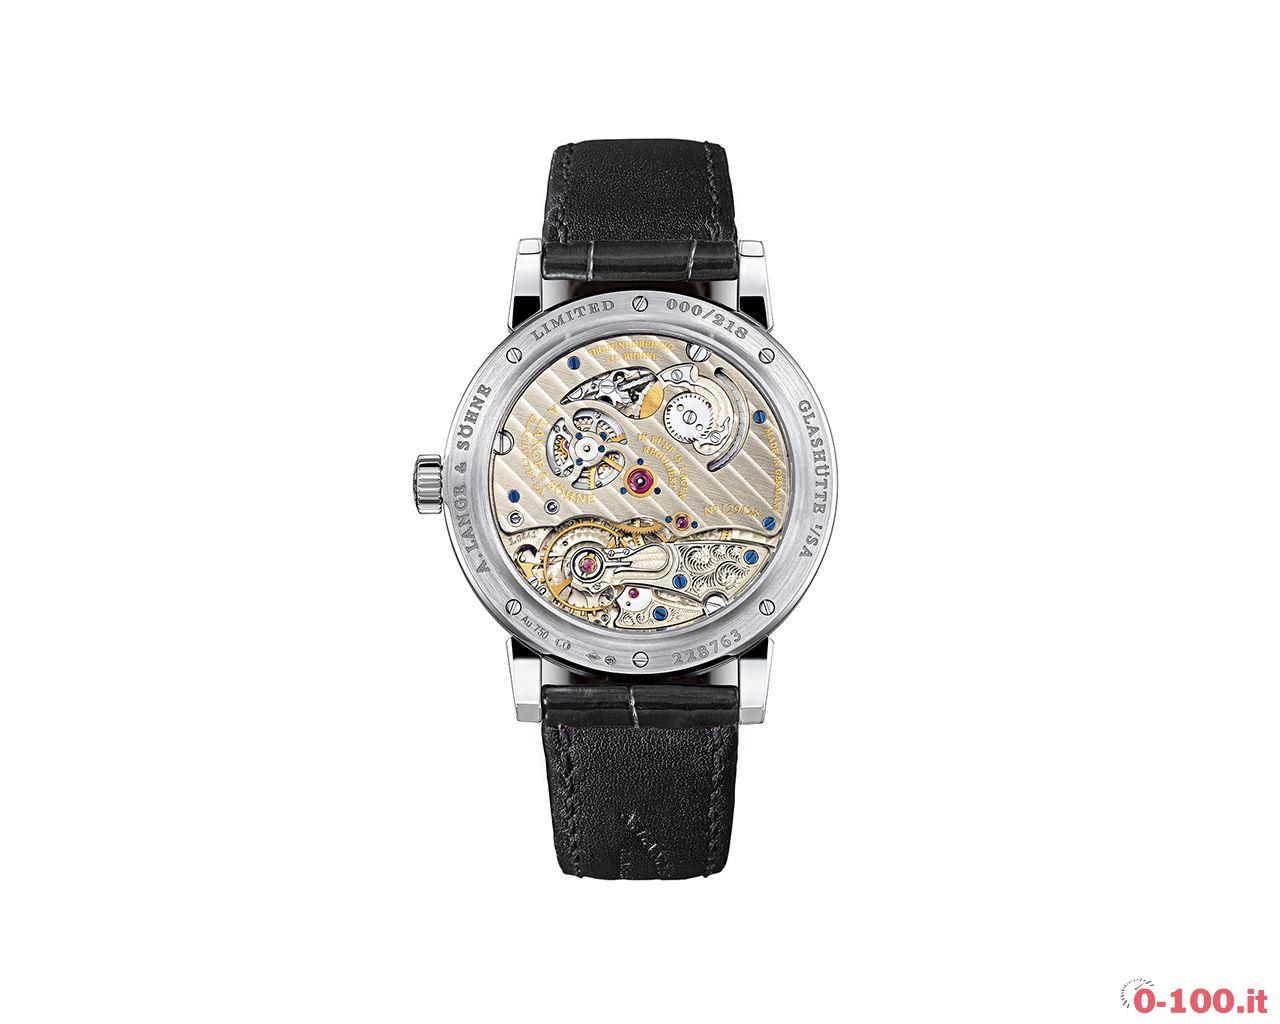 a-lange-sohne-richard-lange-pour-le-merite-limited-edition-ref-260-028-prezzo-price_0-1002